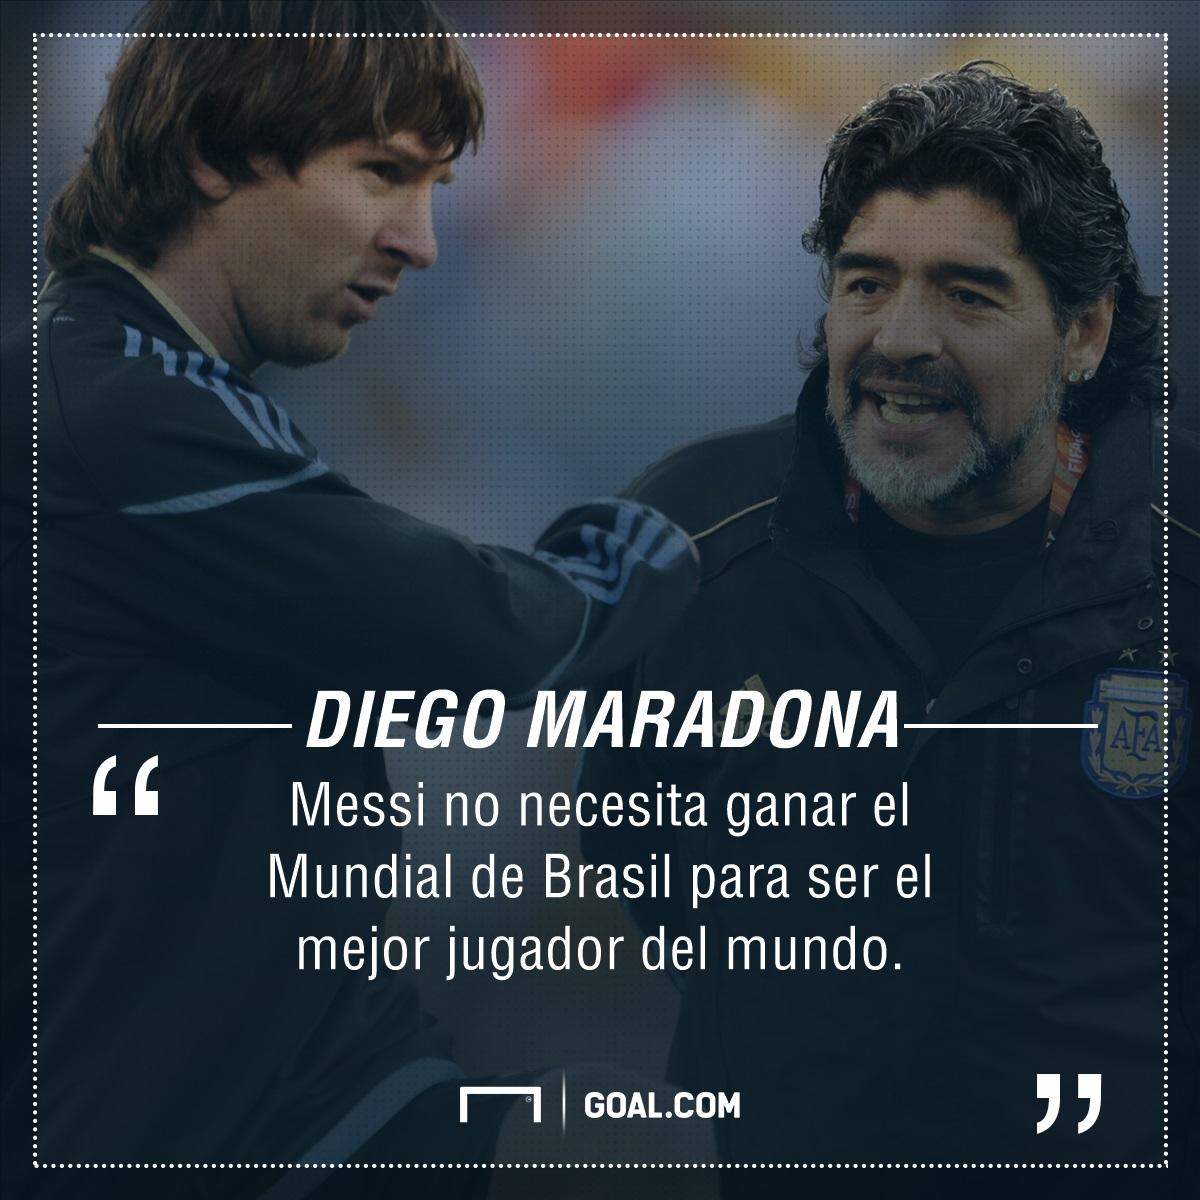 Diego Maradona sobre Lionel Messi: